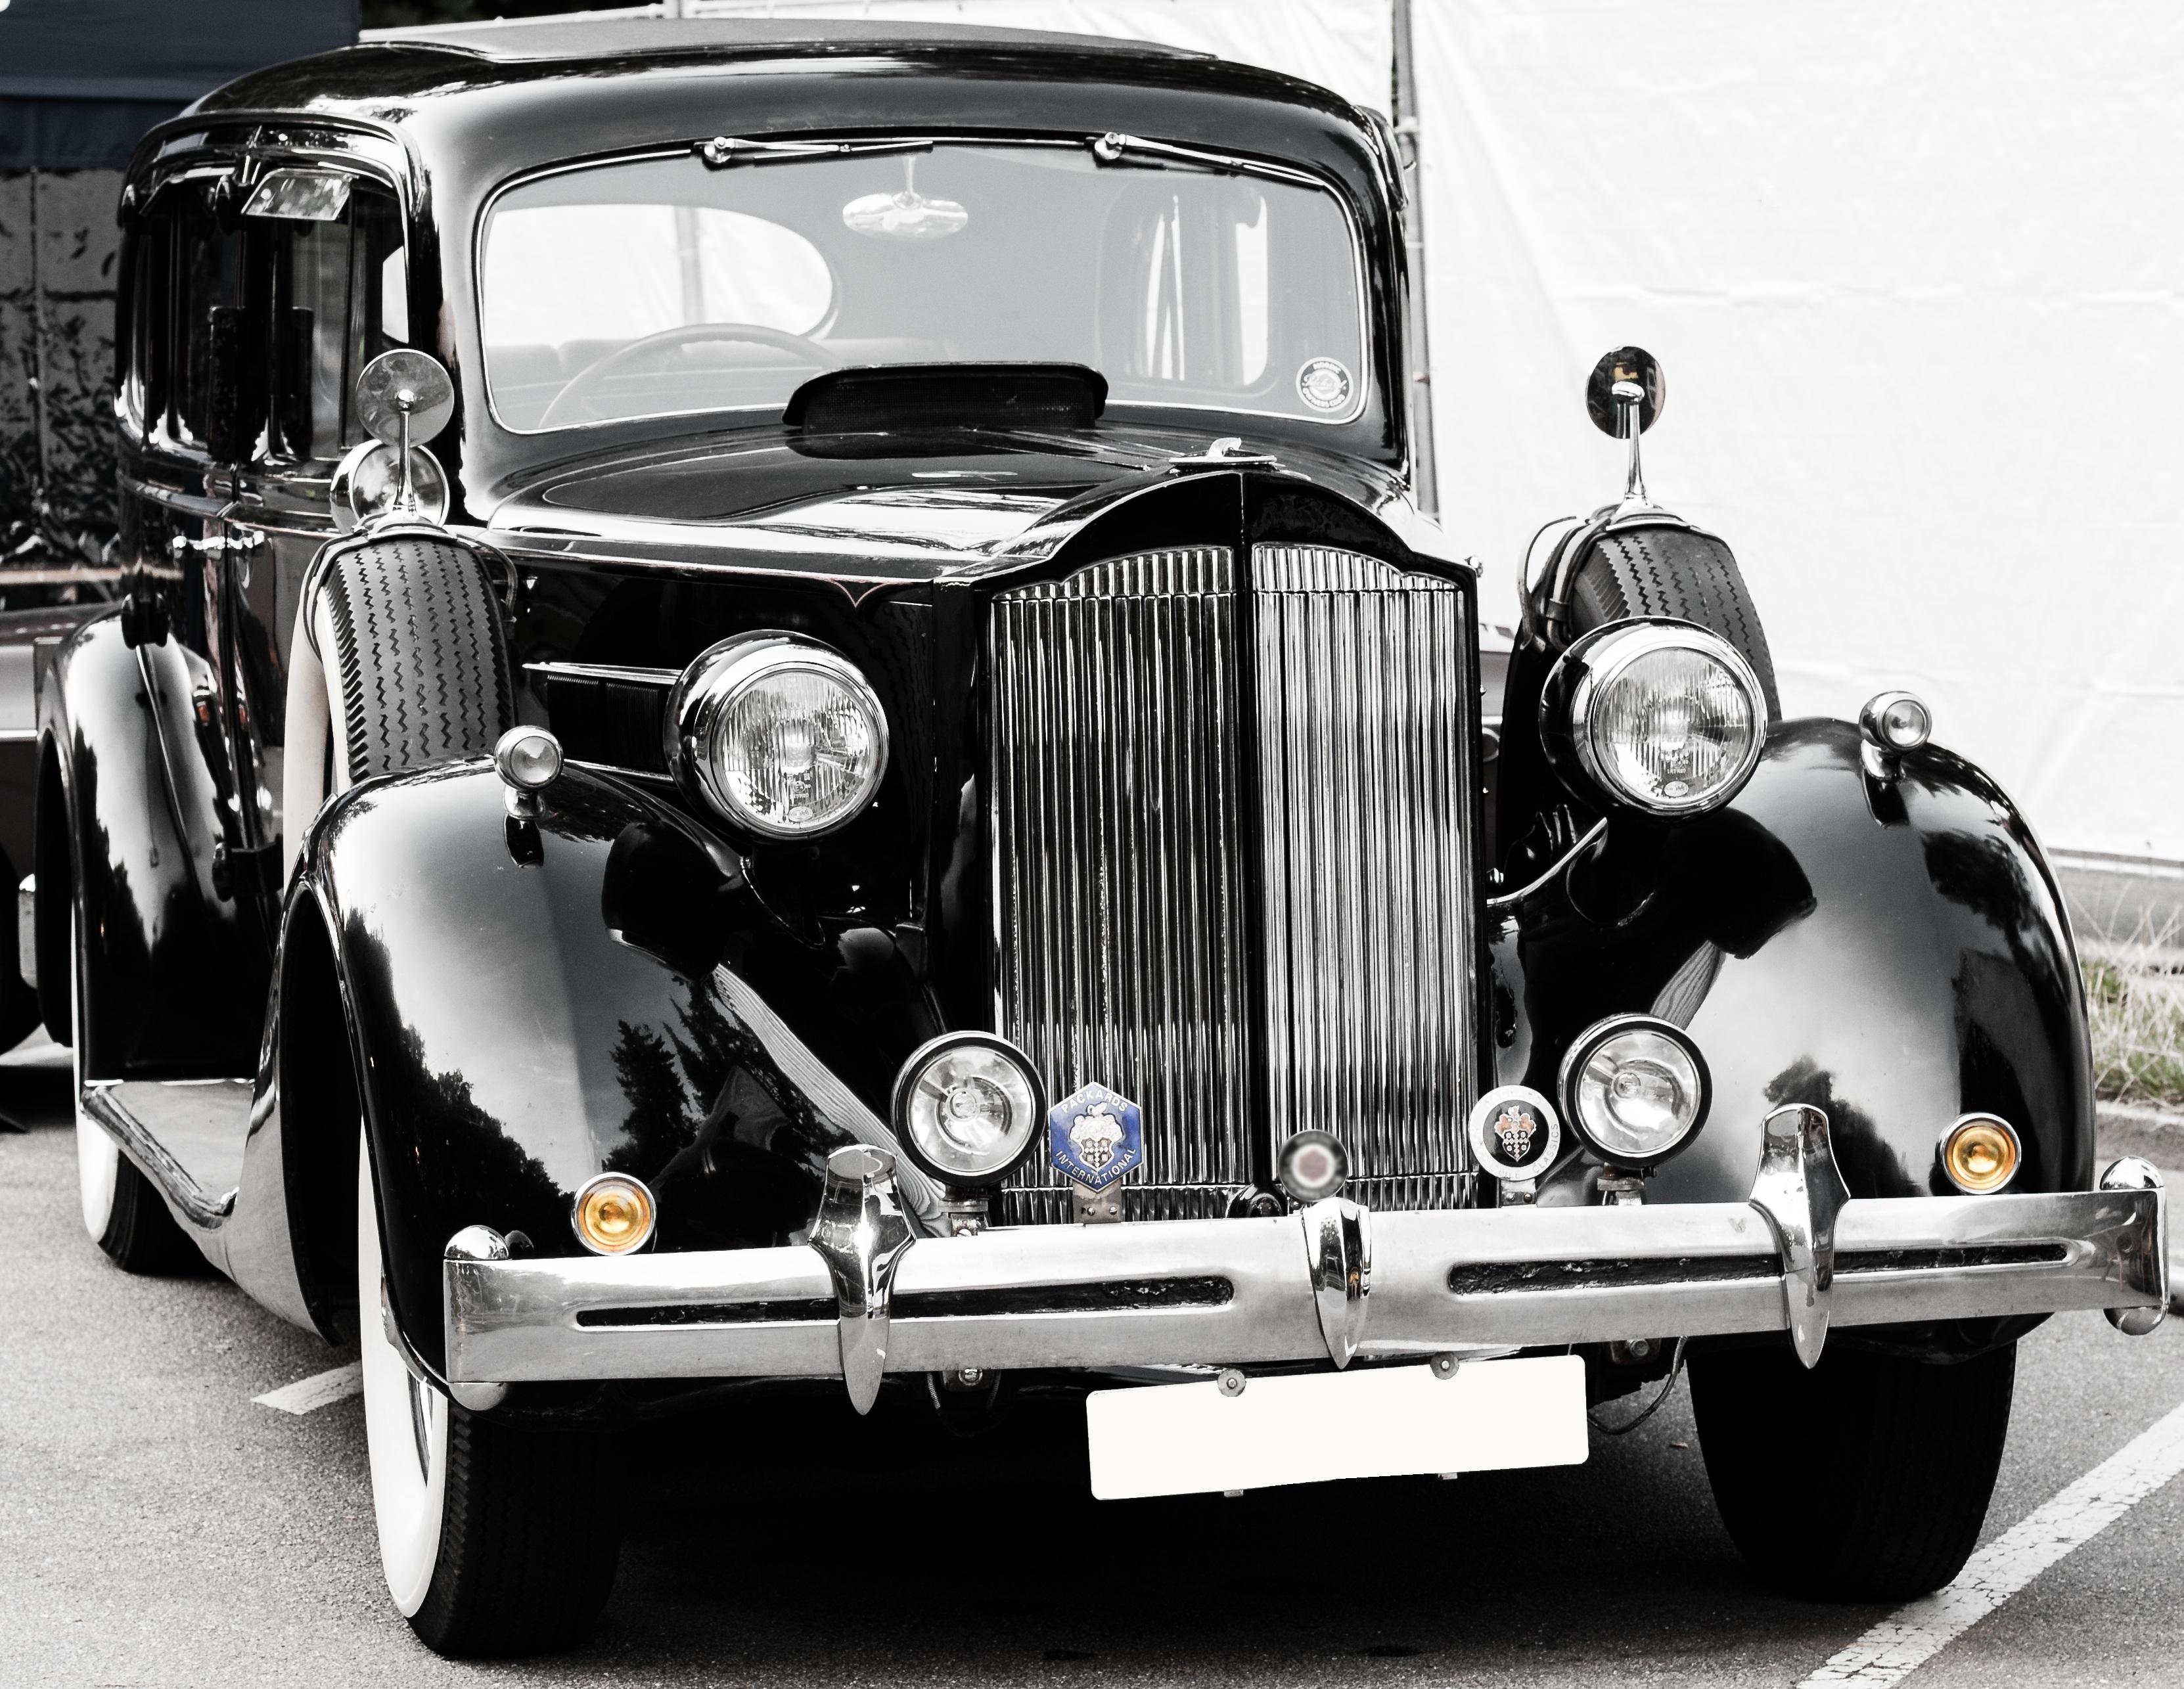 Free Images Retro Metal Auto Nostalgia Black Old Car Spotlight Grille Motor Vehicle Vintage Sheet Art Chrome Silver Sedan Oldtimer